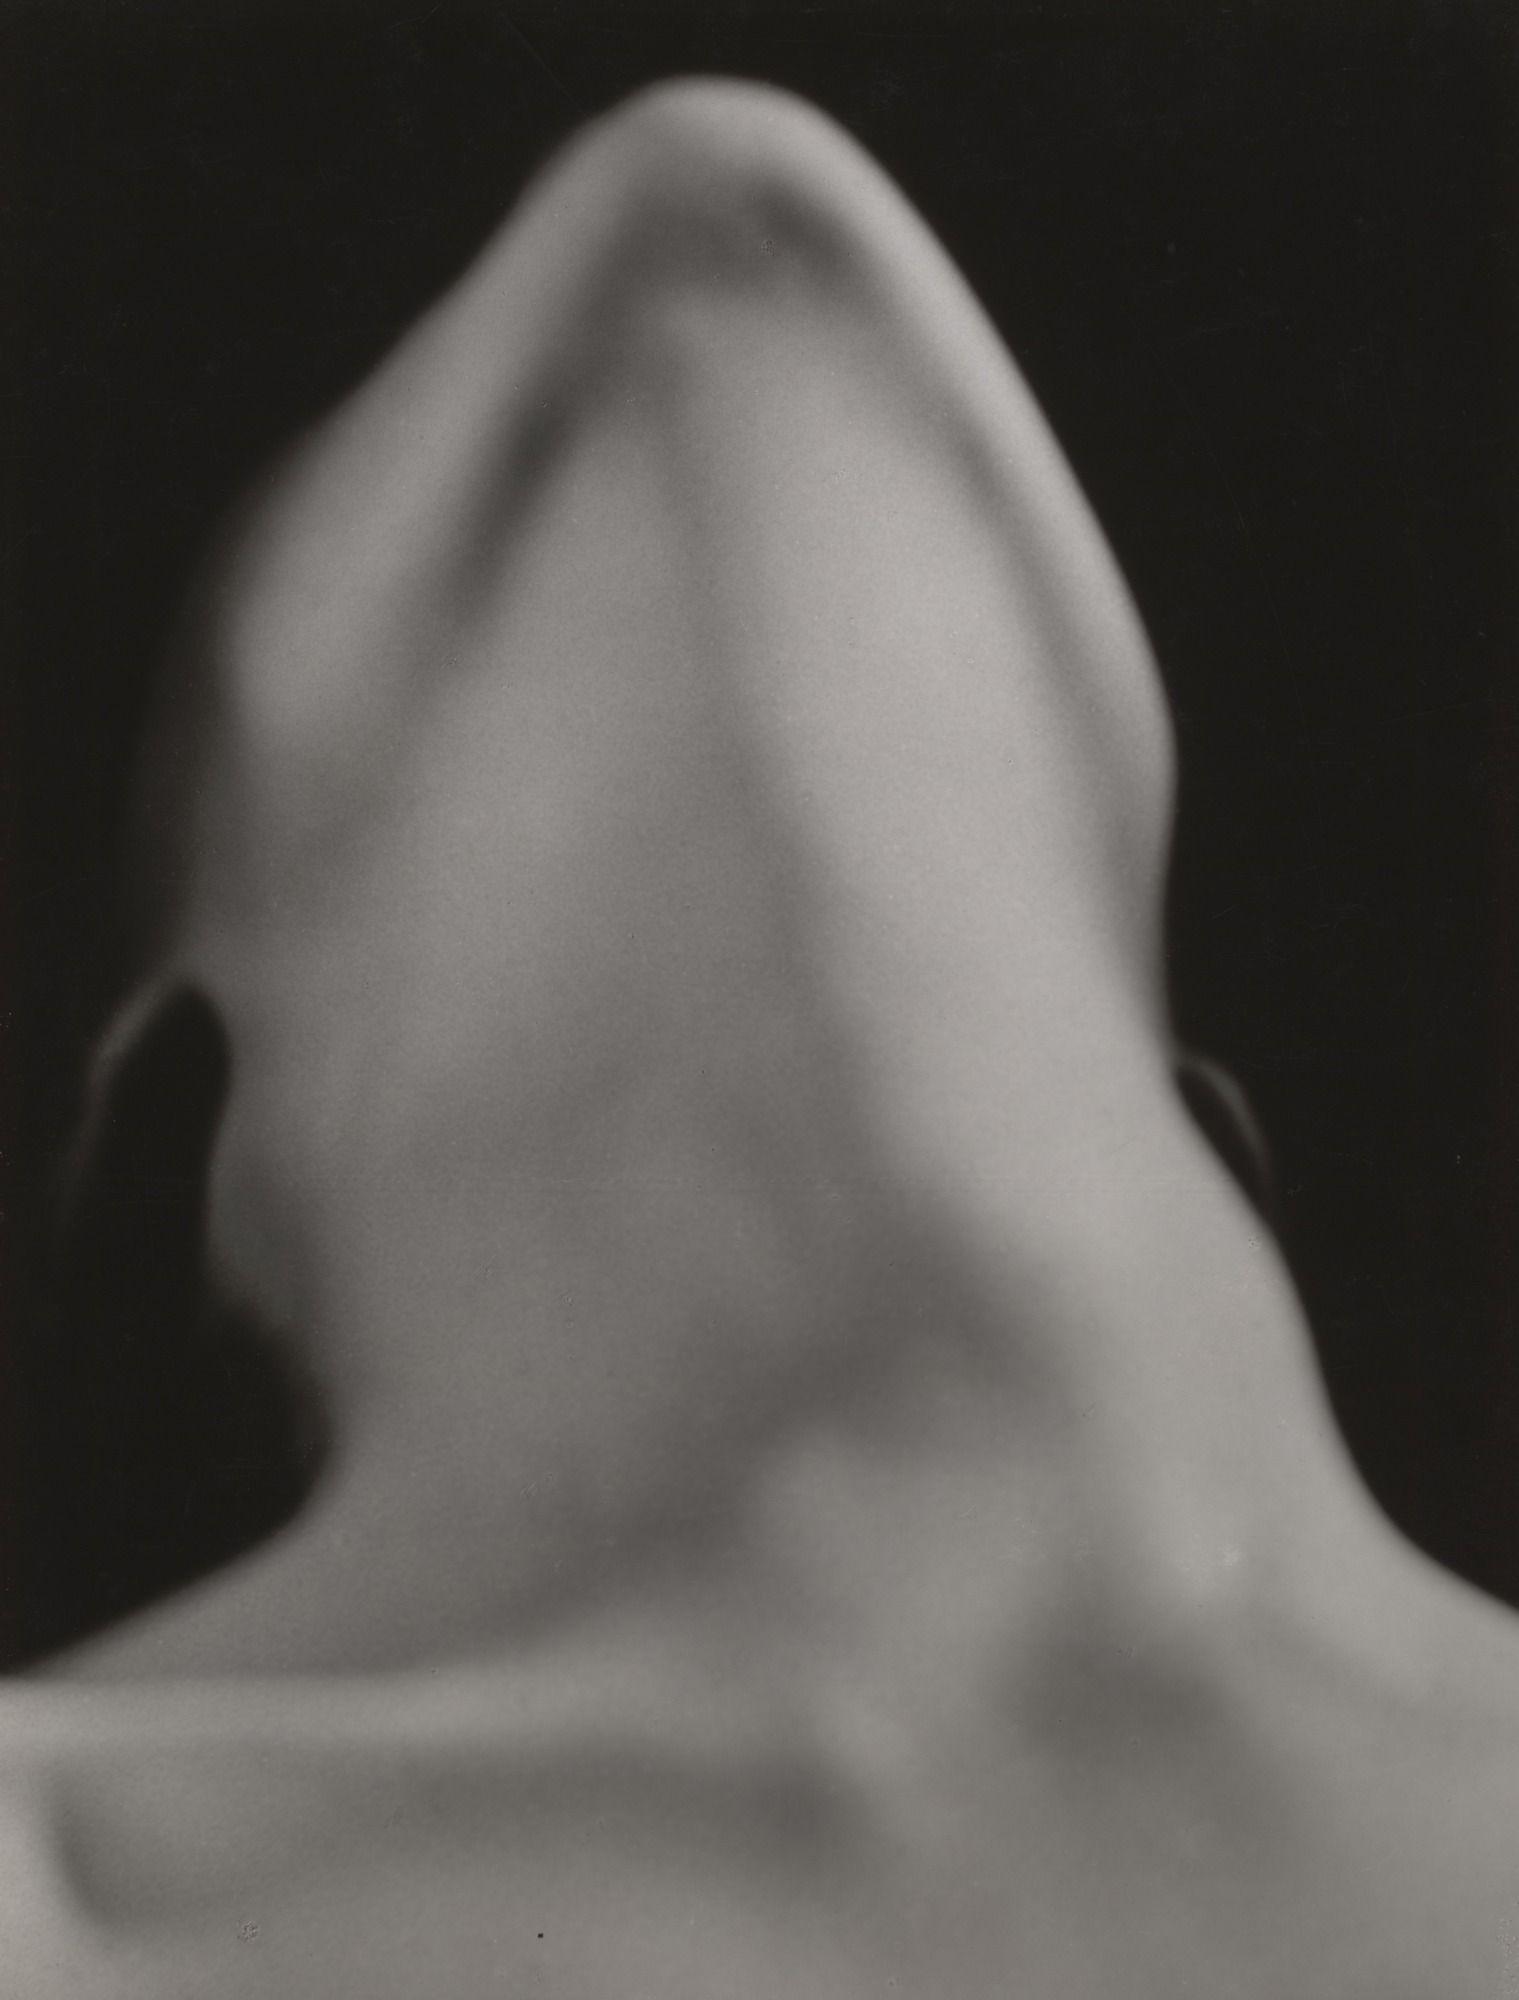 Man ray anatomies 1929 gelatin silver print 8 7 8 x 6 3 4 22 6 x 17 2 cm